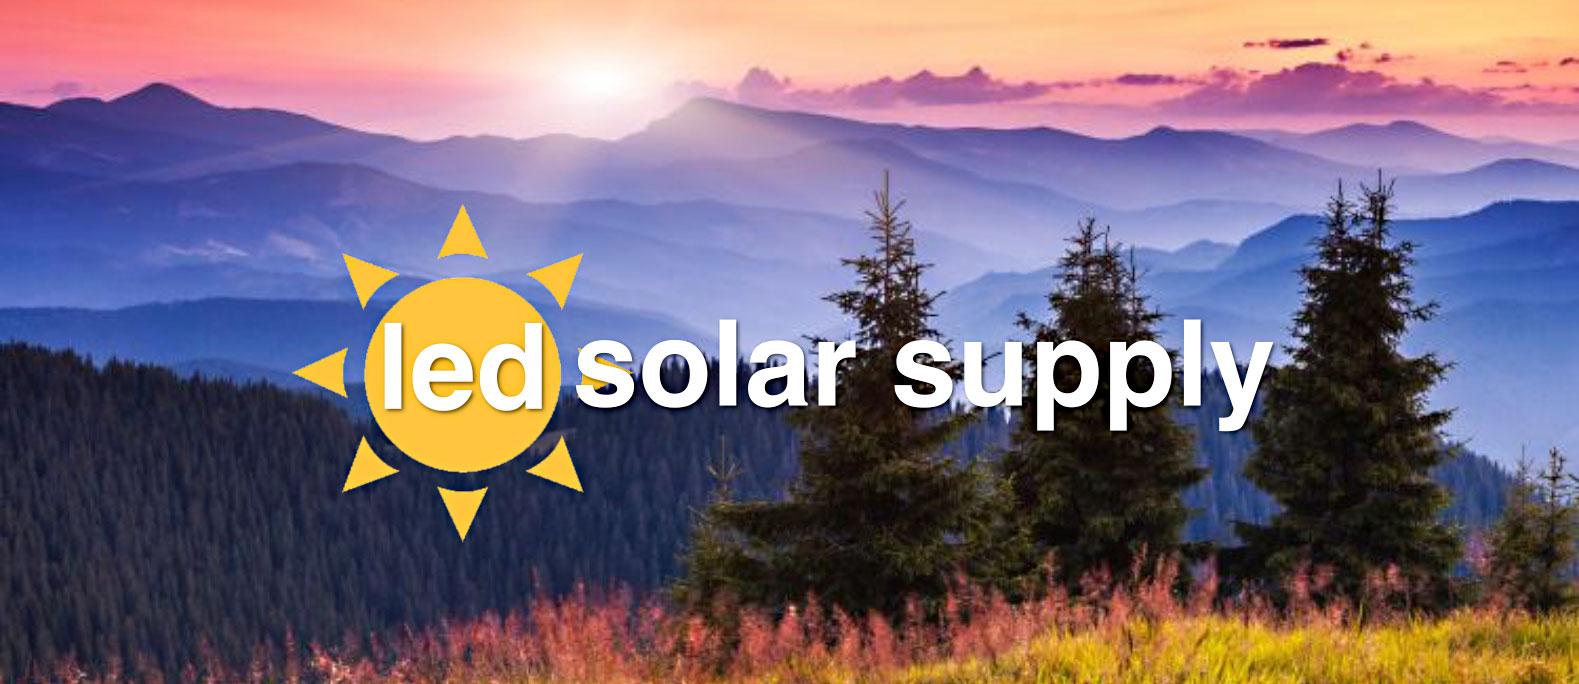 LED Solar Supply Sun Powered Lights